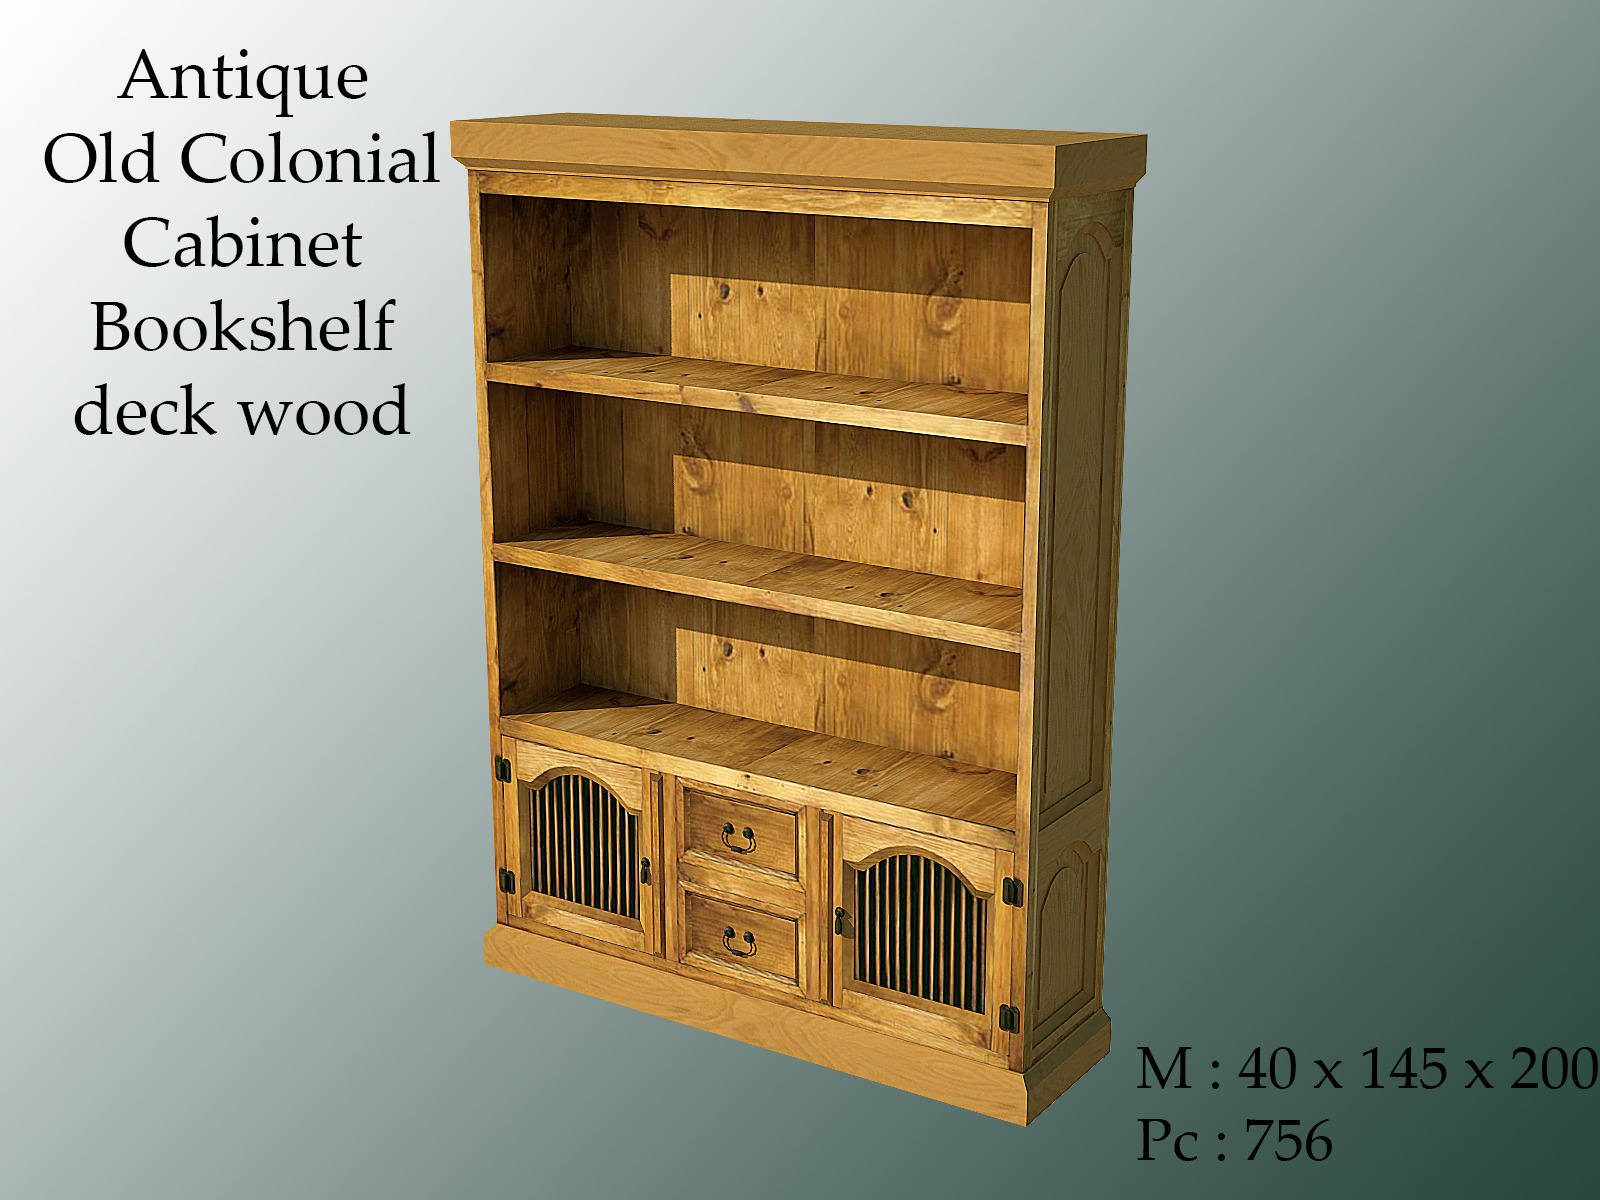 Antique Old Colonial Cabinet Bookshelf by hpstudio   3DOcean